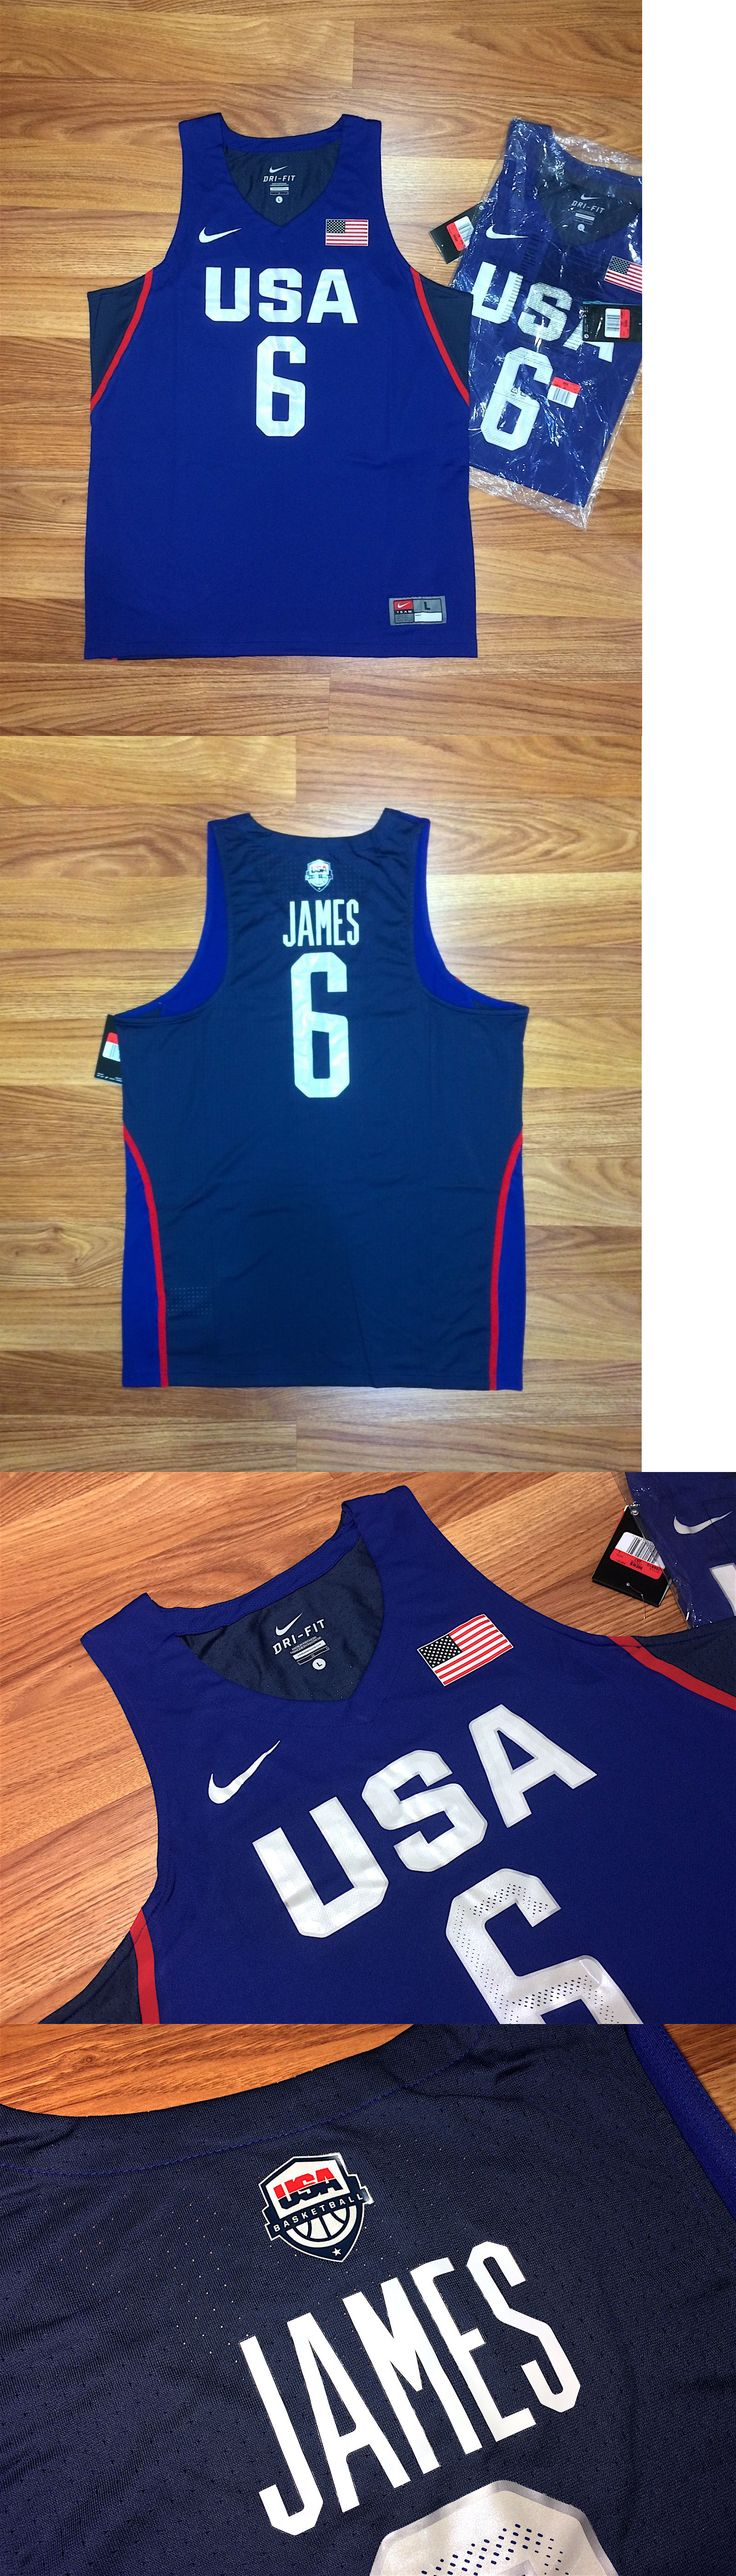 Basketball-Other 205: 2016 Nike Usa Basketball Lebron James Game Jersey Olympic Fiba Nba Cavs Blue L -> BUY IT NOW ONLY: $69.99 on eBay!